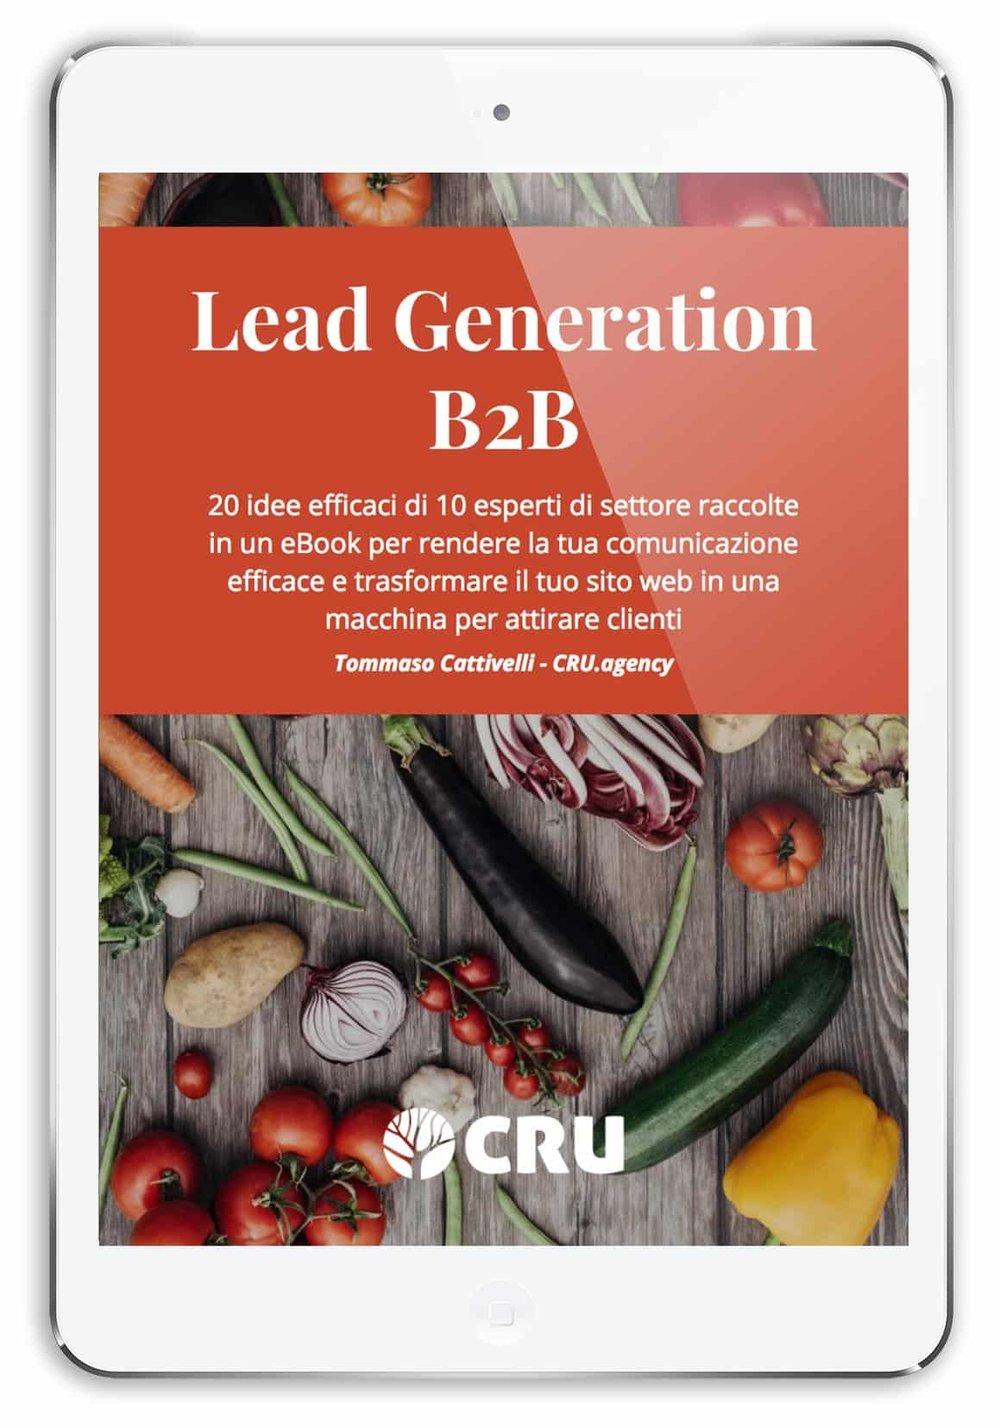 lead generation b2b per l'agroalimentare